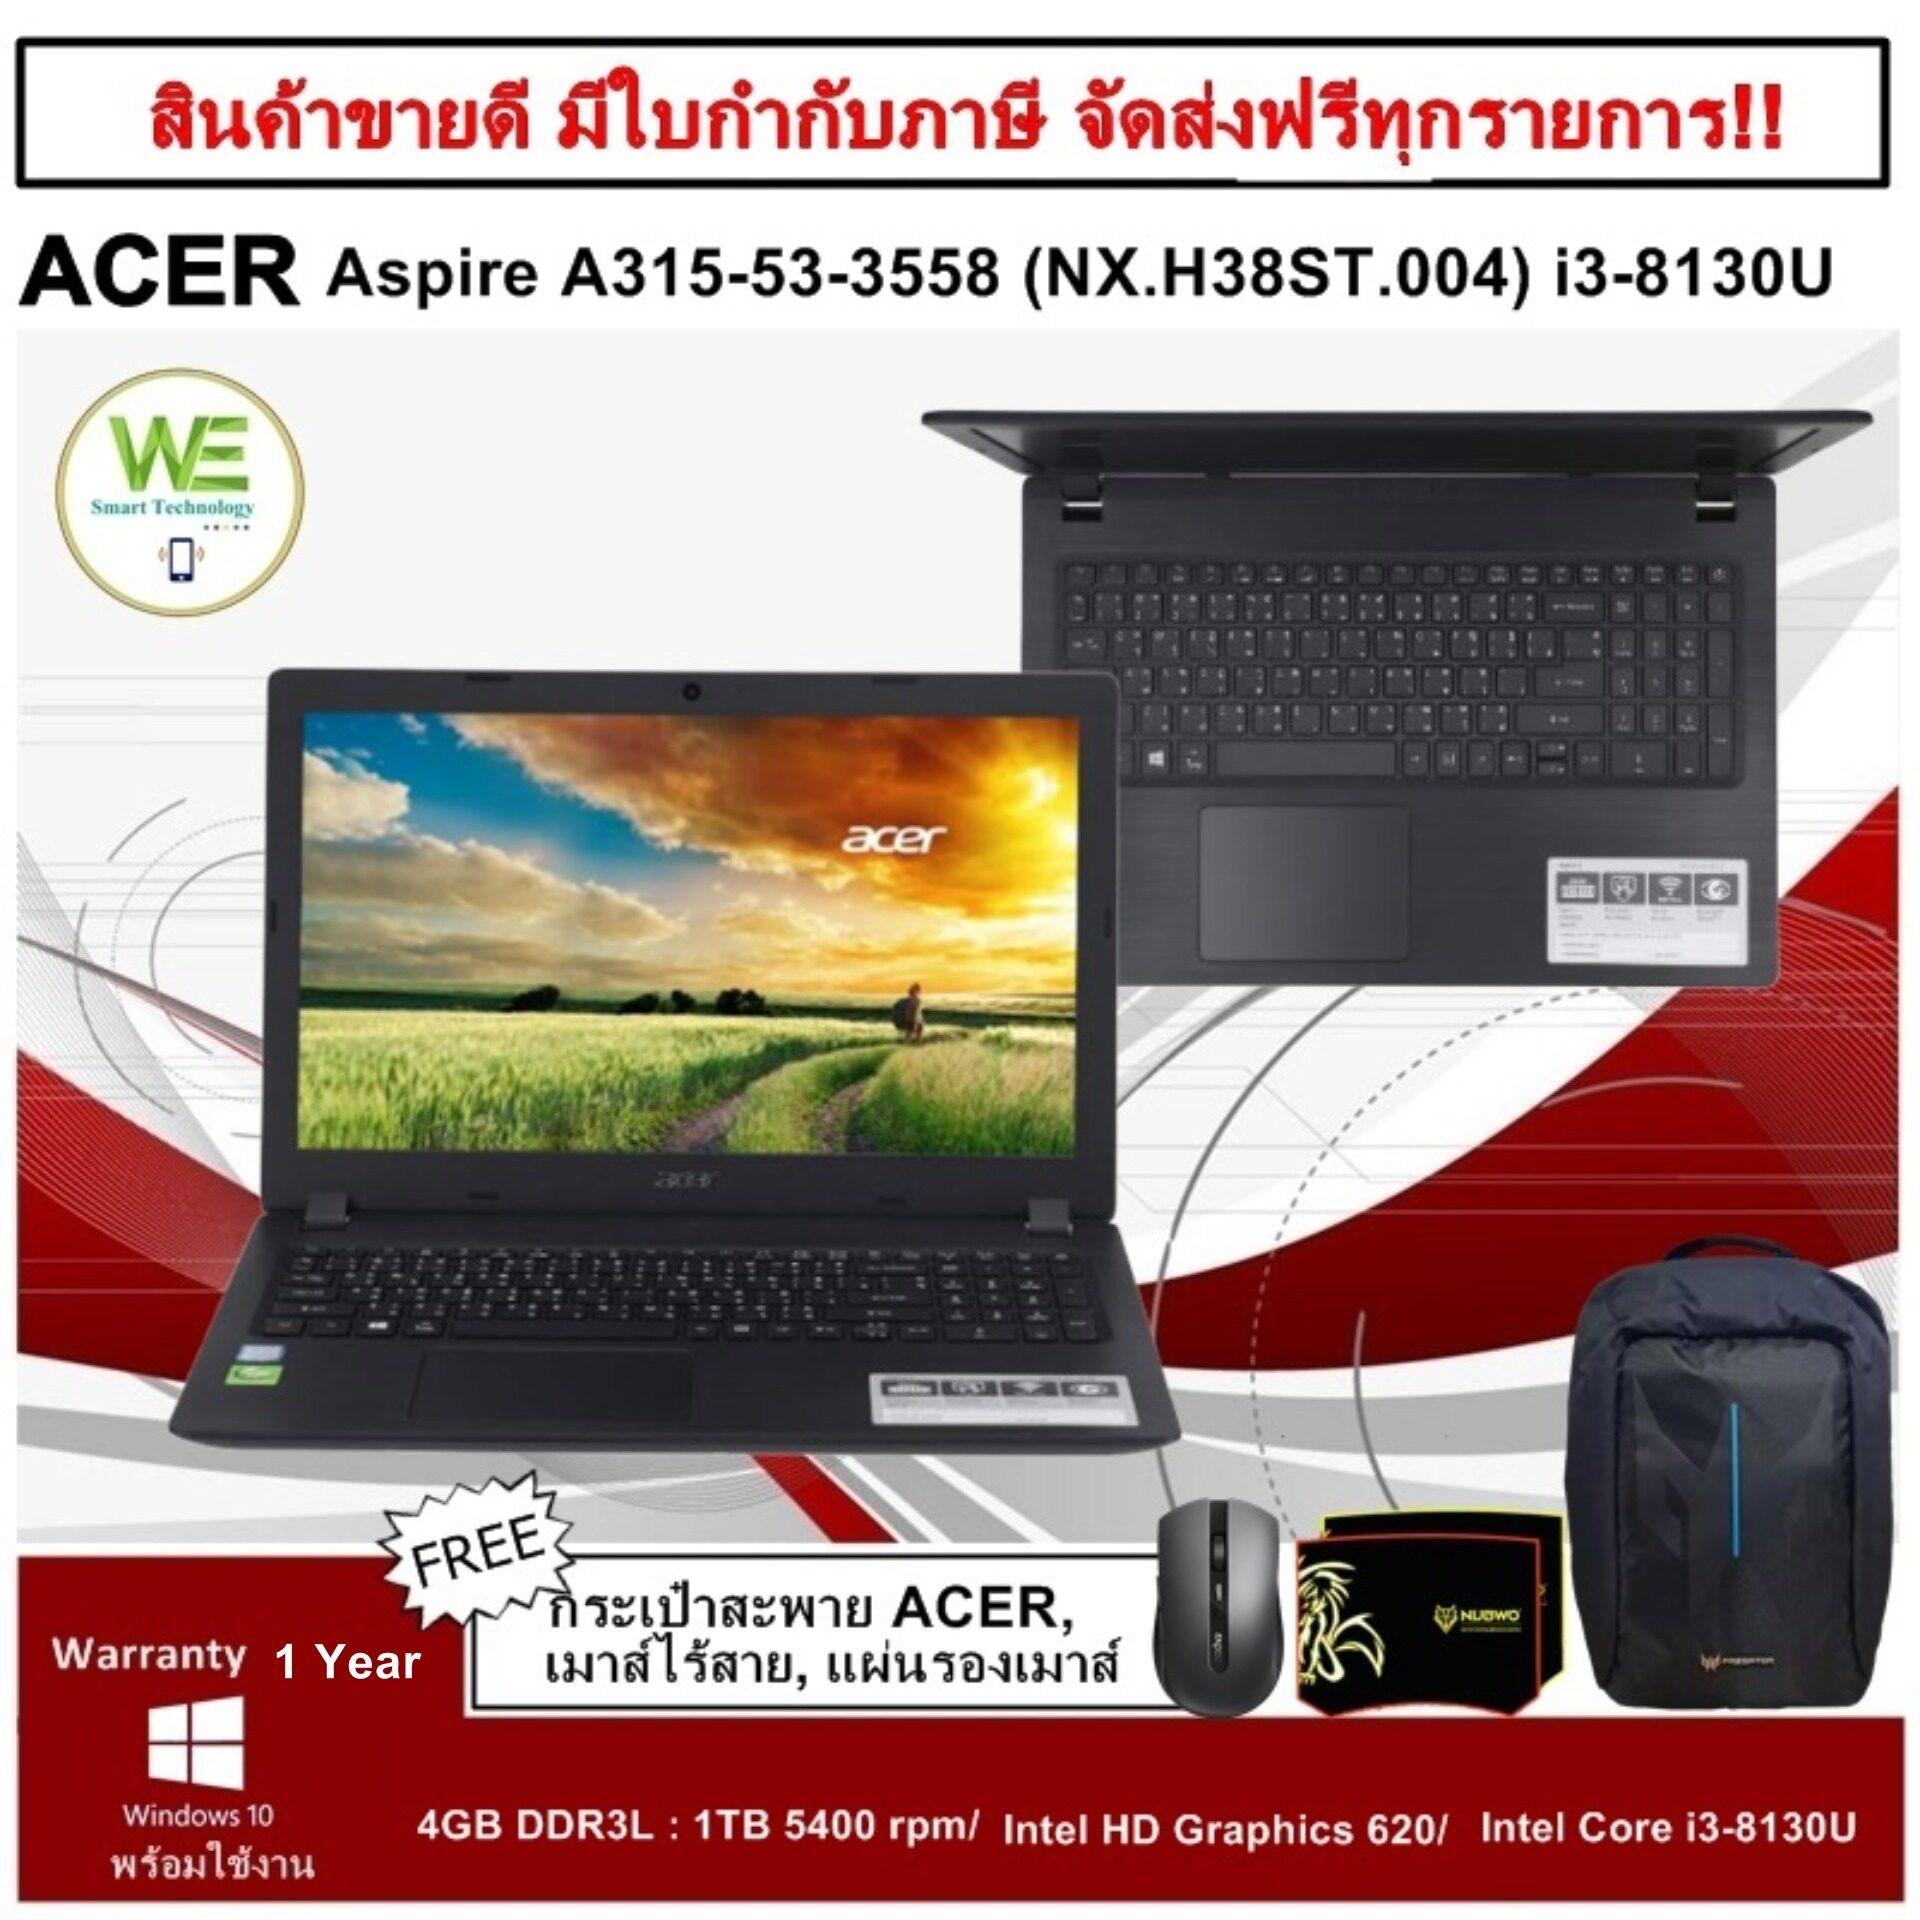 Acer Notebook Aspire A315-53-3558 (nx.h38st.004) I3-8130u/4gb/1tb/intel Hd Graphics/15.6  Hd/win10home/black.